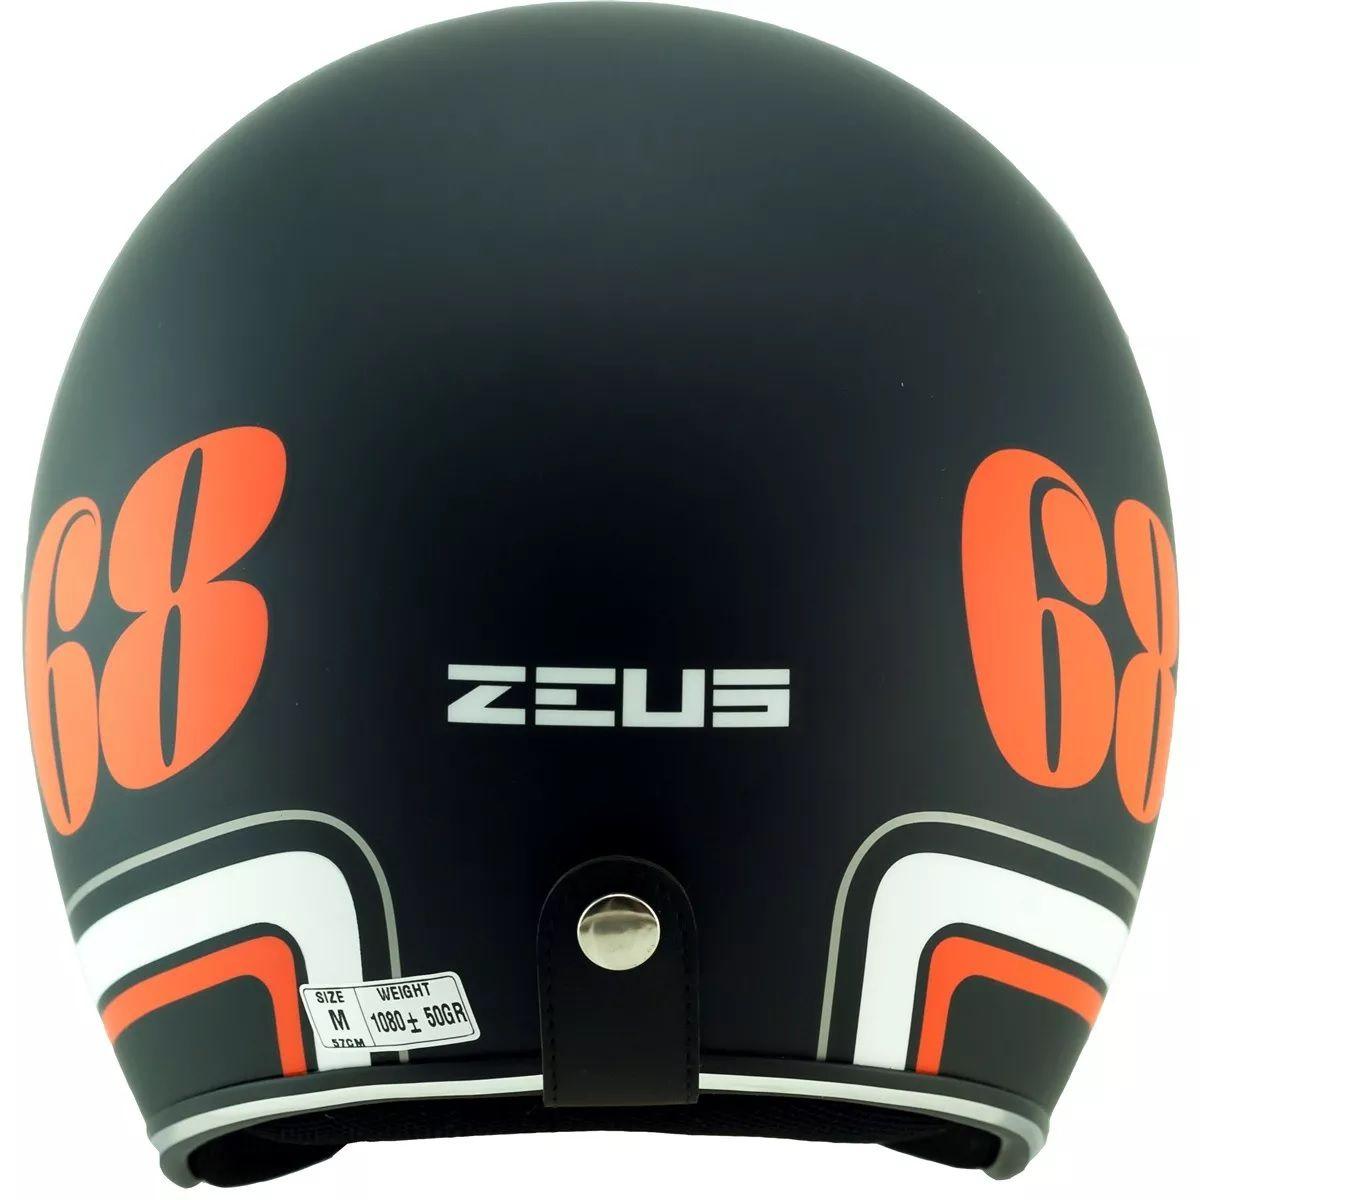 Capacete Zeus 380H Preto Fosco e Laranja  - Ditesta & Daihead - Moto Store